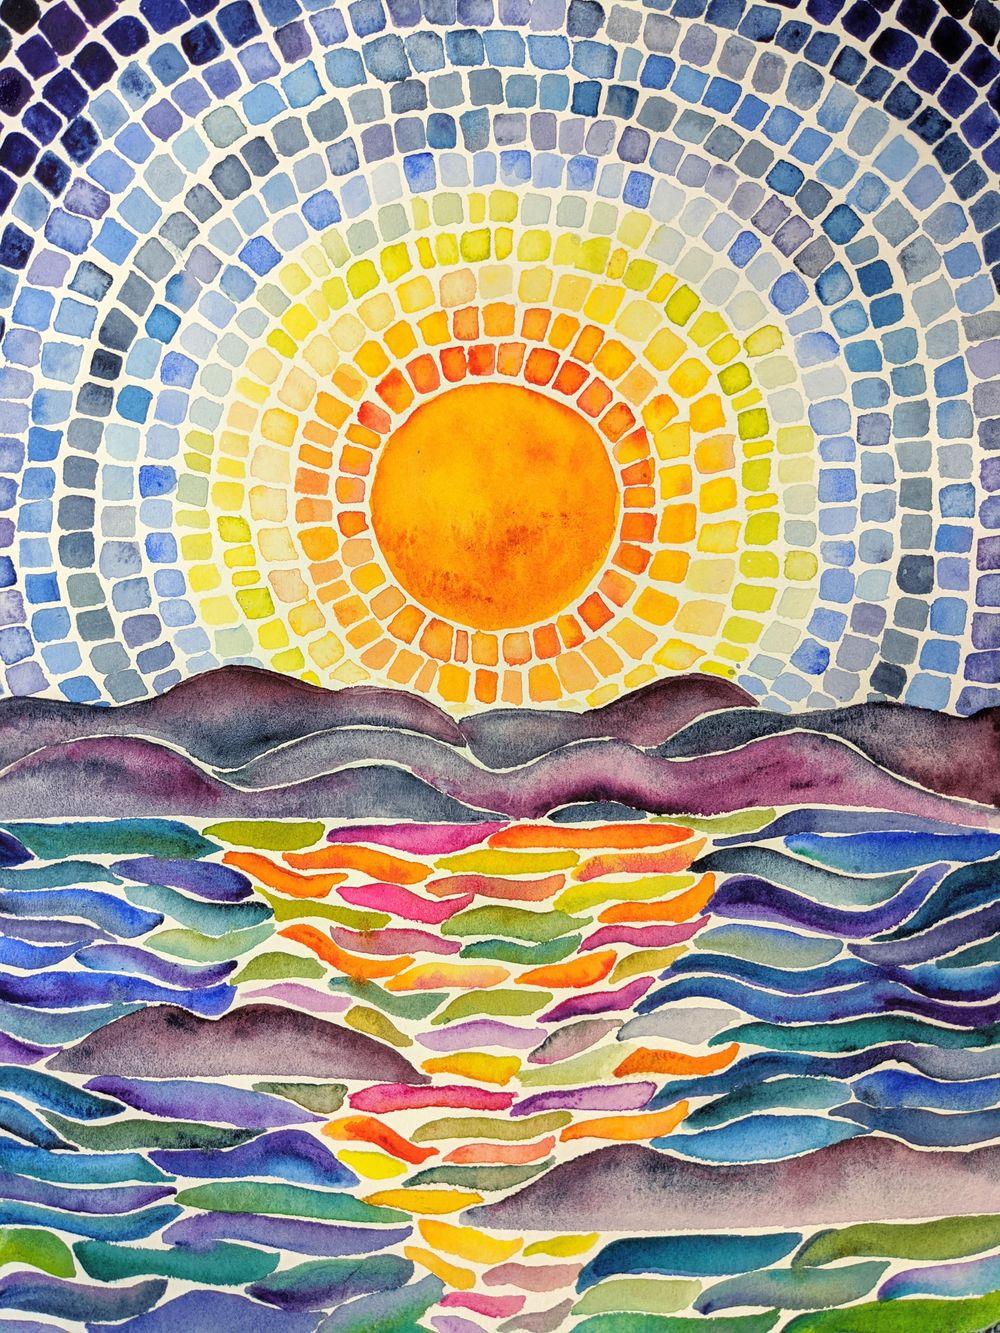 Mosaics -- Many Ways -- Seahorse, Sunset, Stained Glass Window, Yin Yang, Mermai - image 4 - student project